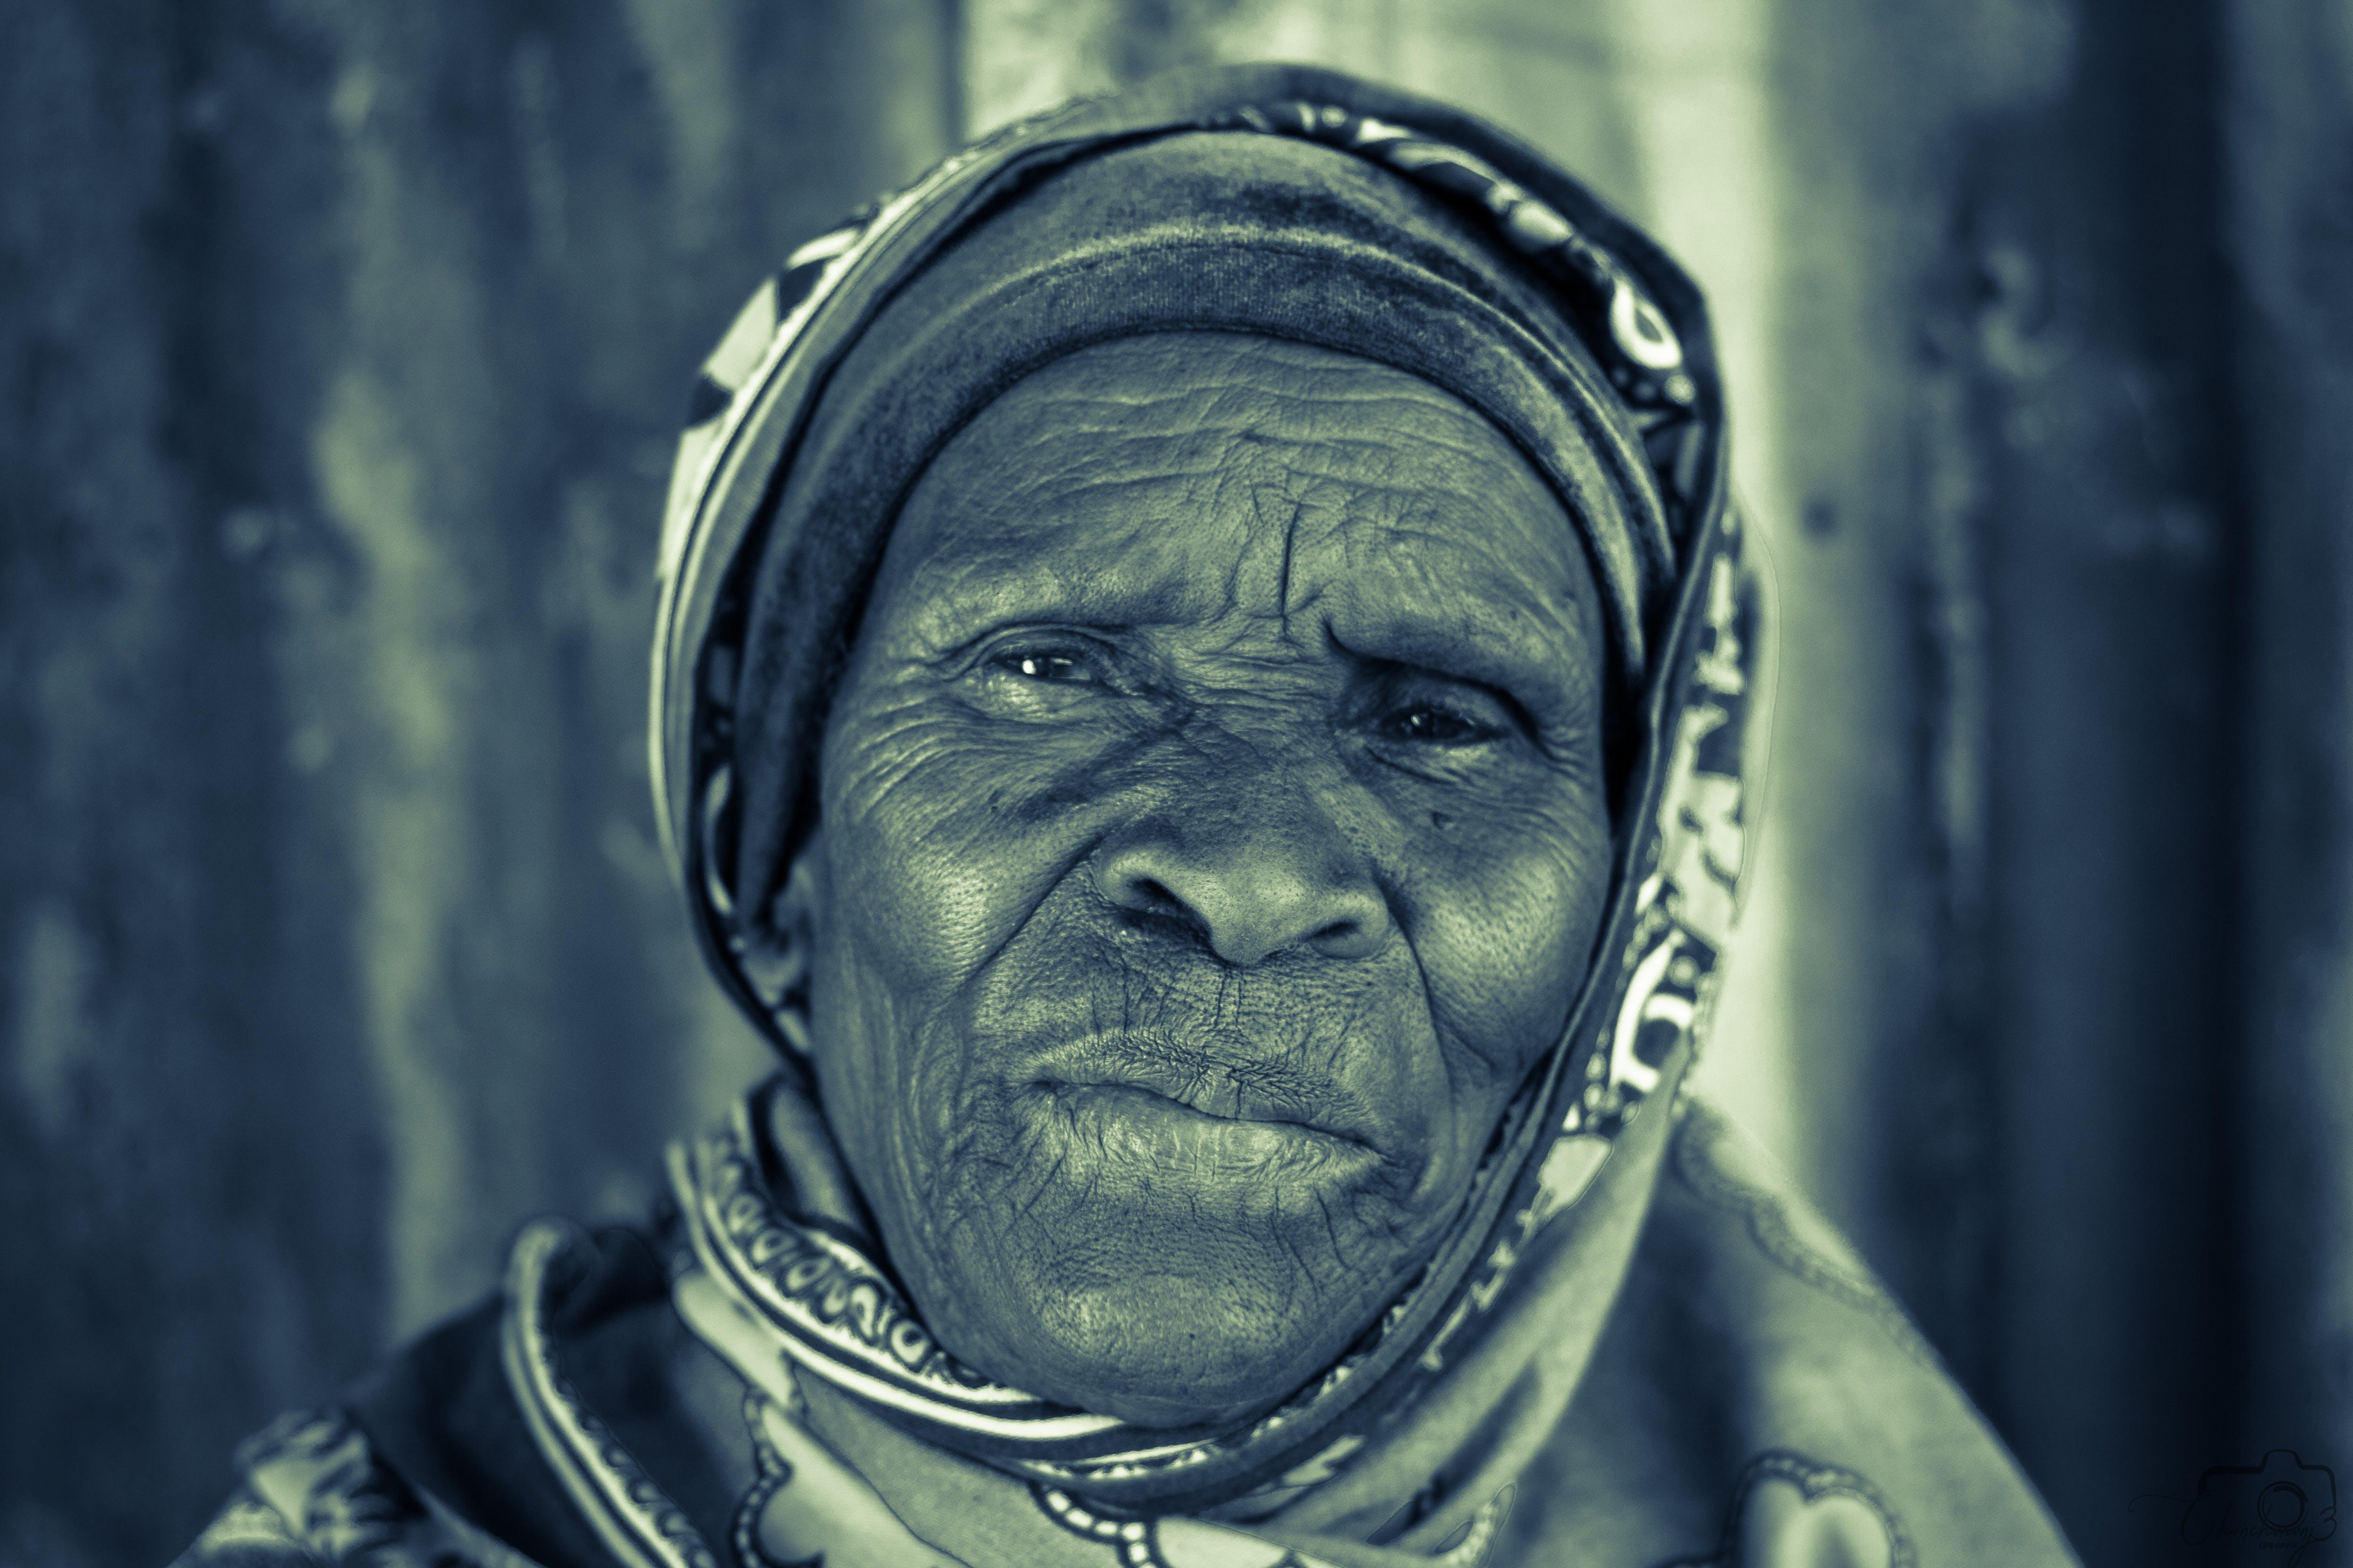 Free stock photo of #chaucharanje, #outdoorchallenge, #tanzania, canon